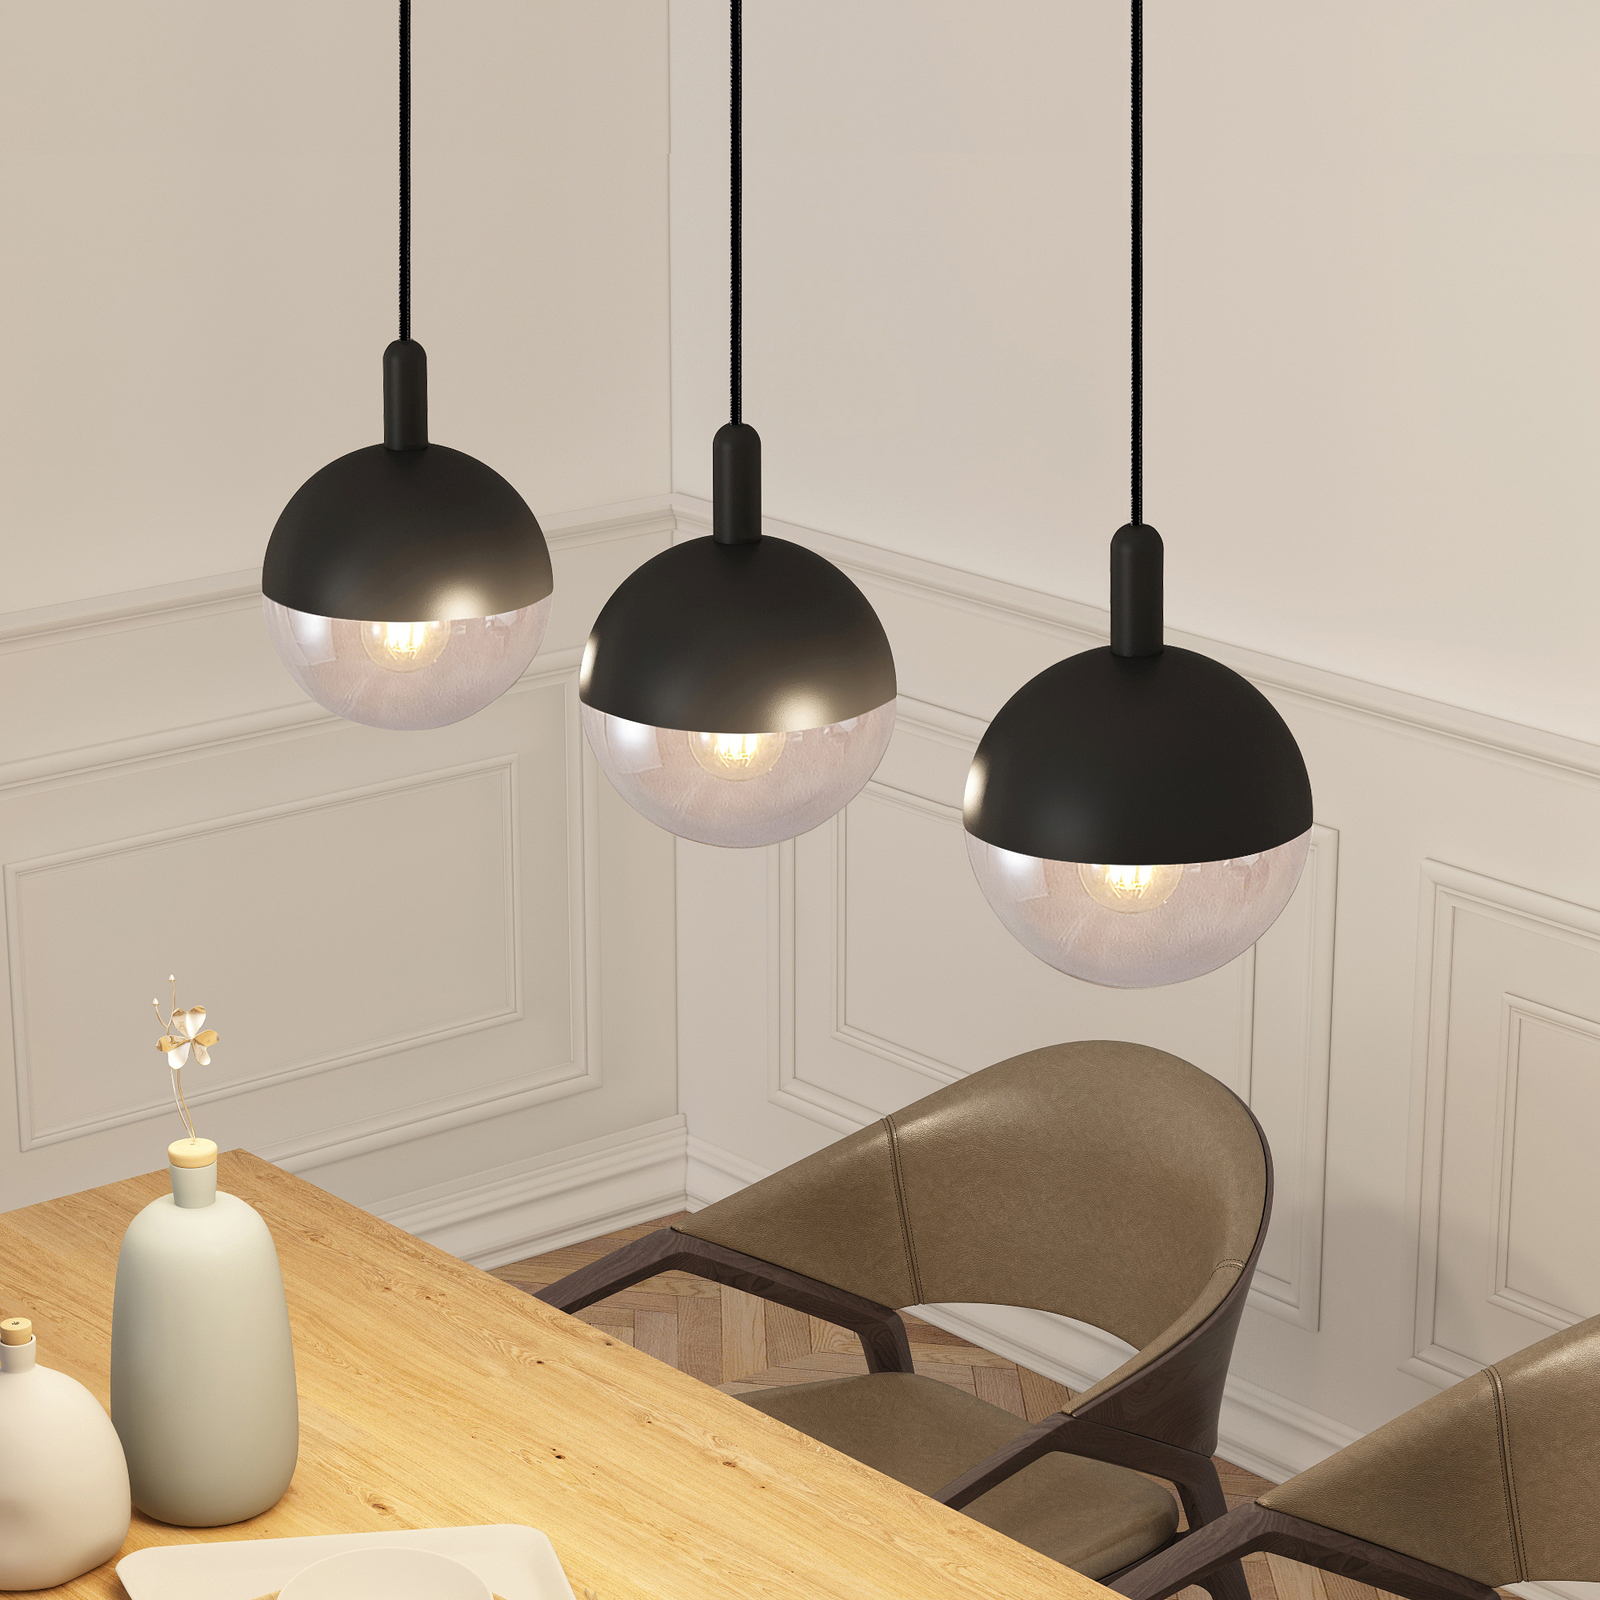 Lucande Dustian hänglampa, 3 lampor, 90 cm